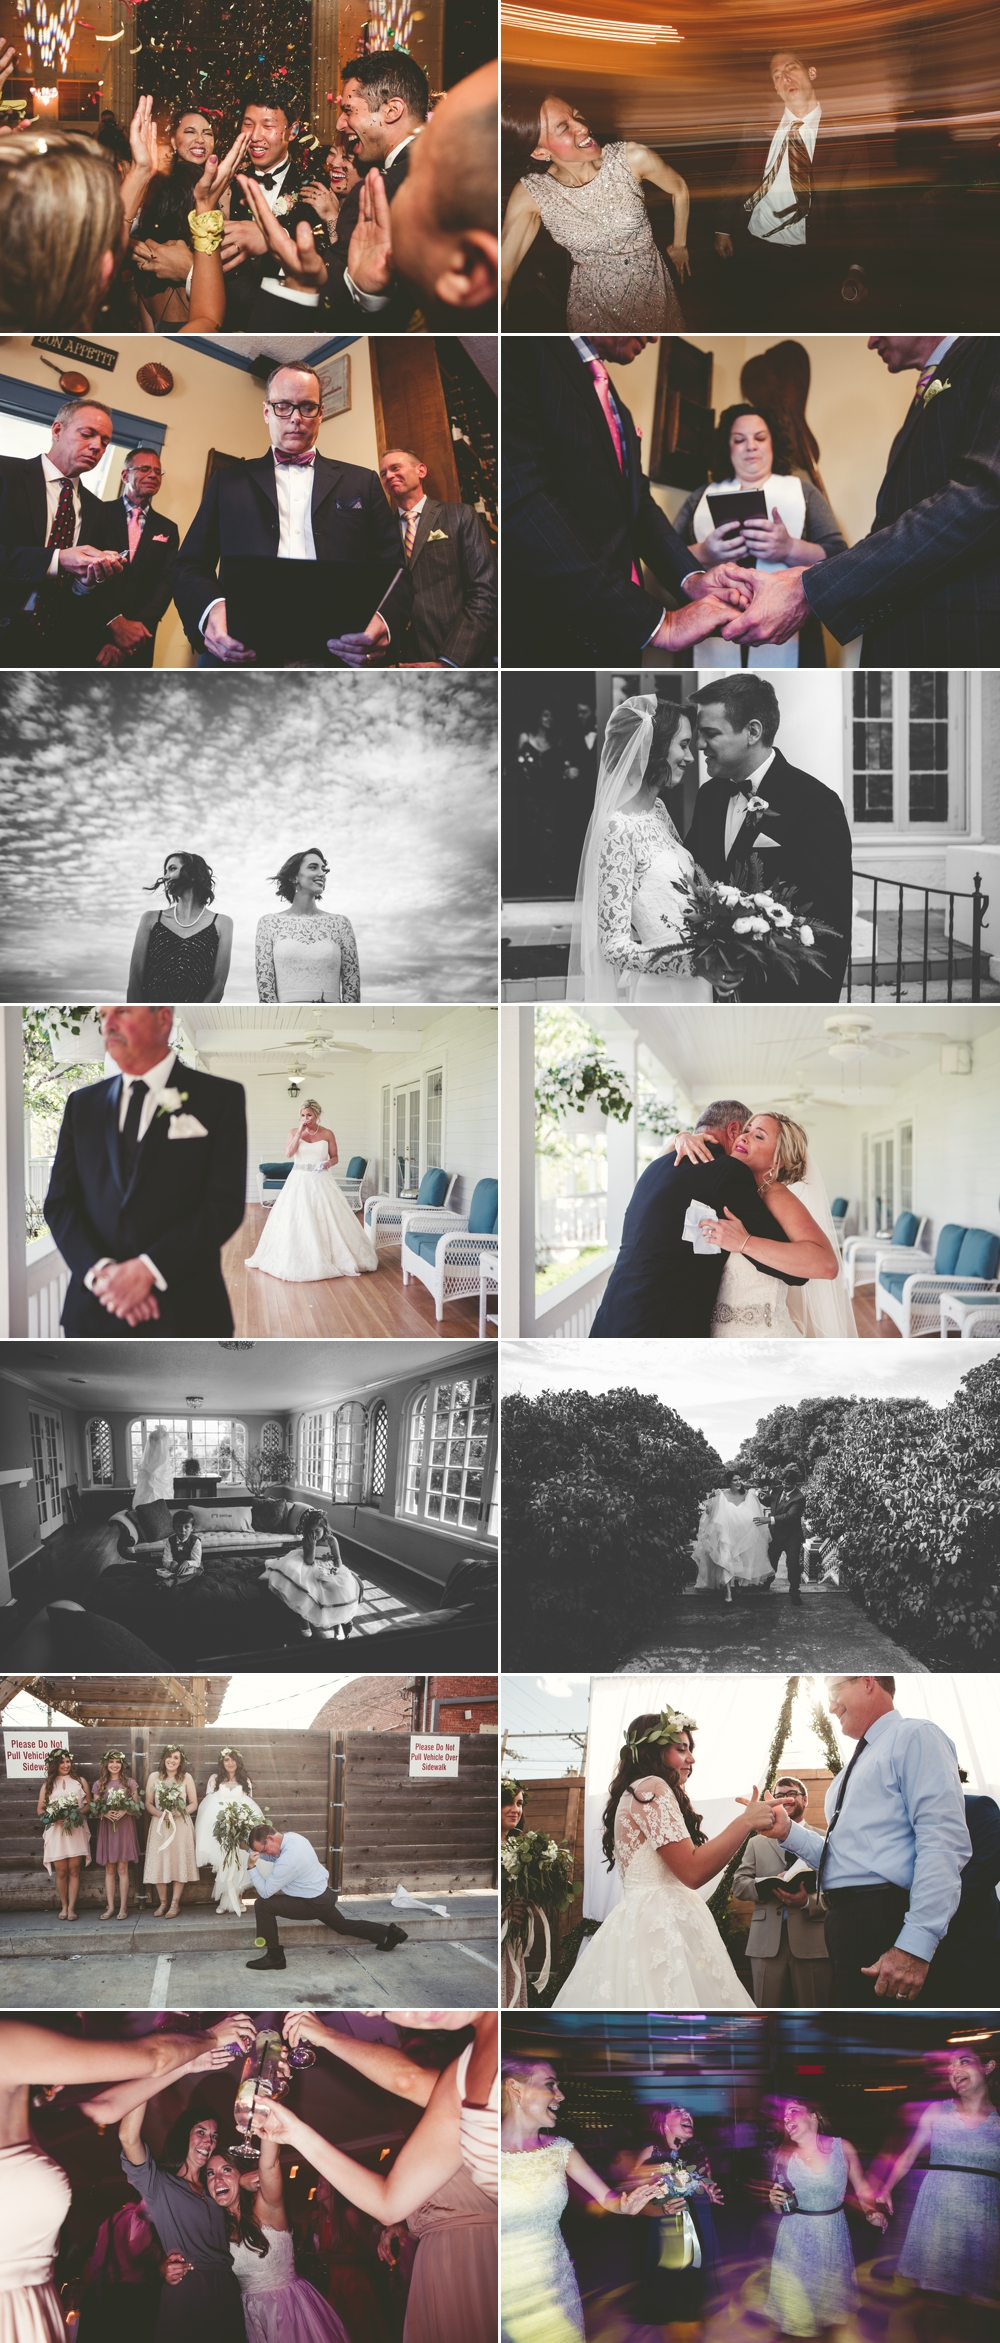 jason_domingues_photography_best_kansas_city_photography_kc_wedding_weddings0007.jpg